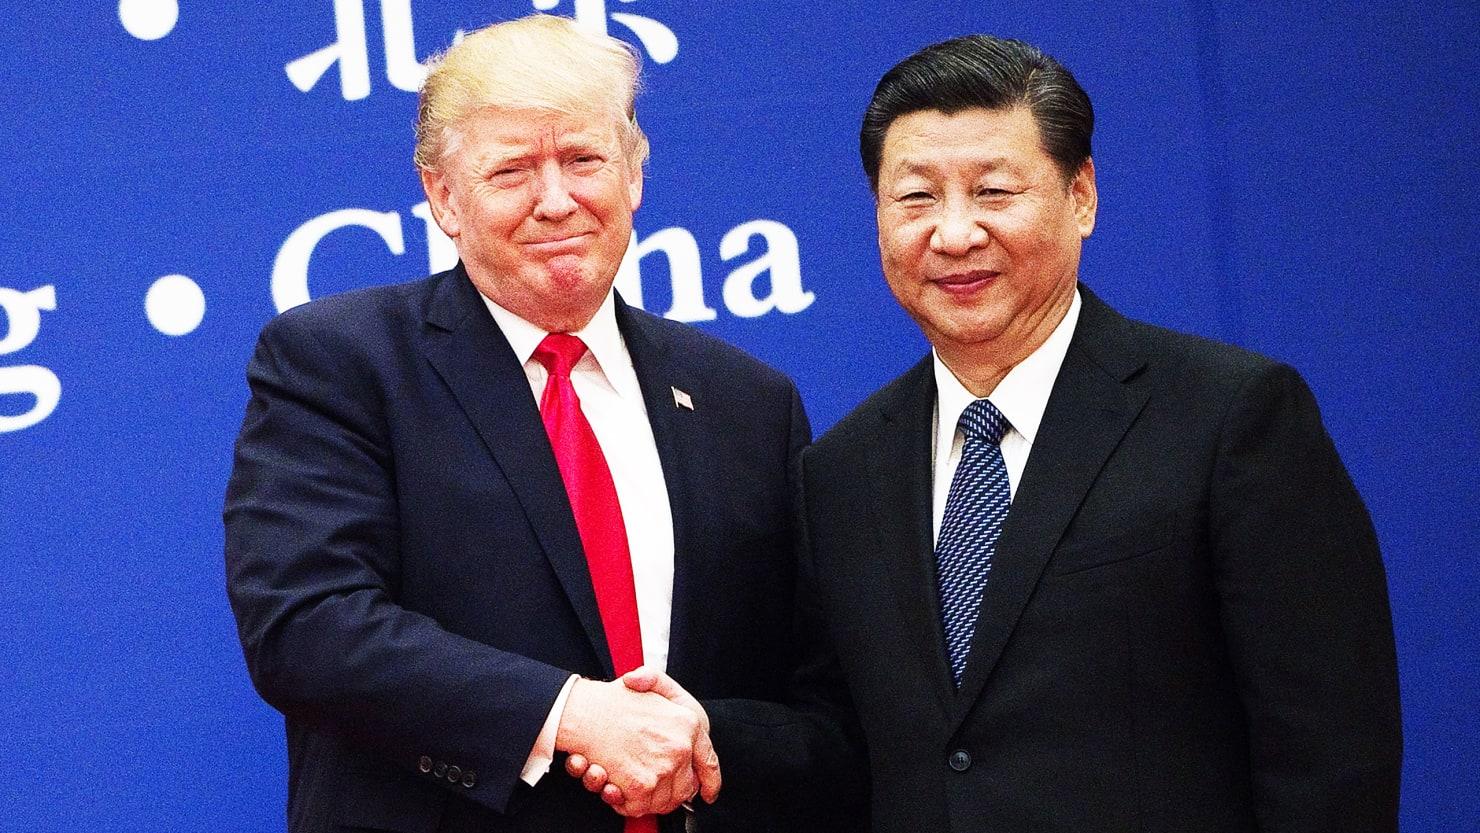 Trumps Letting Chinas Big Banks Launder North Koreas Cash Wiring Money To China